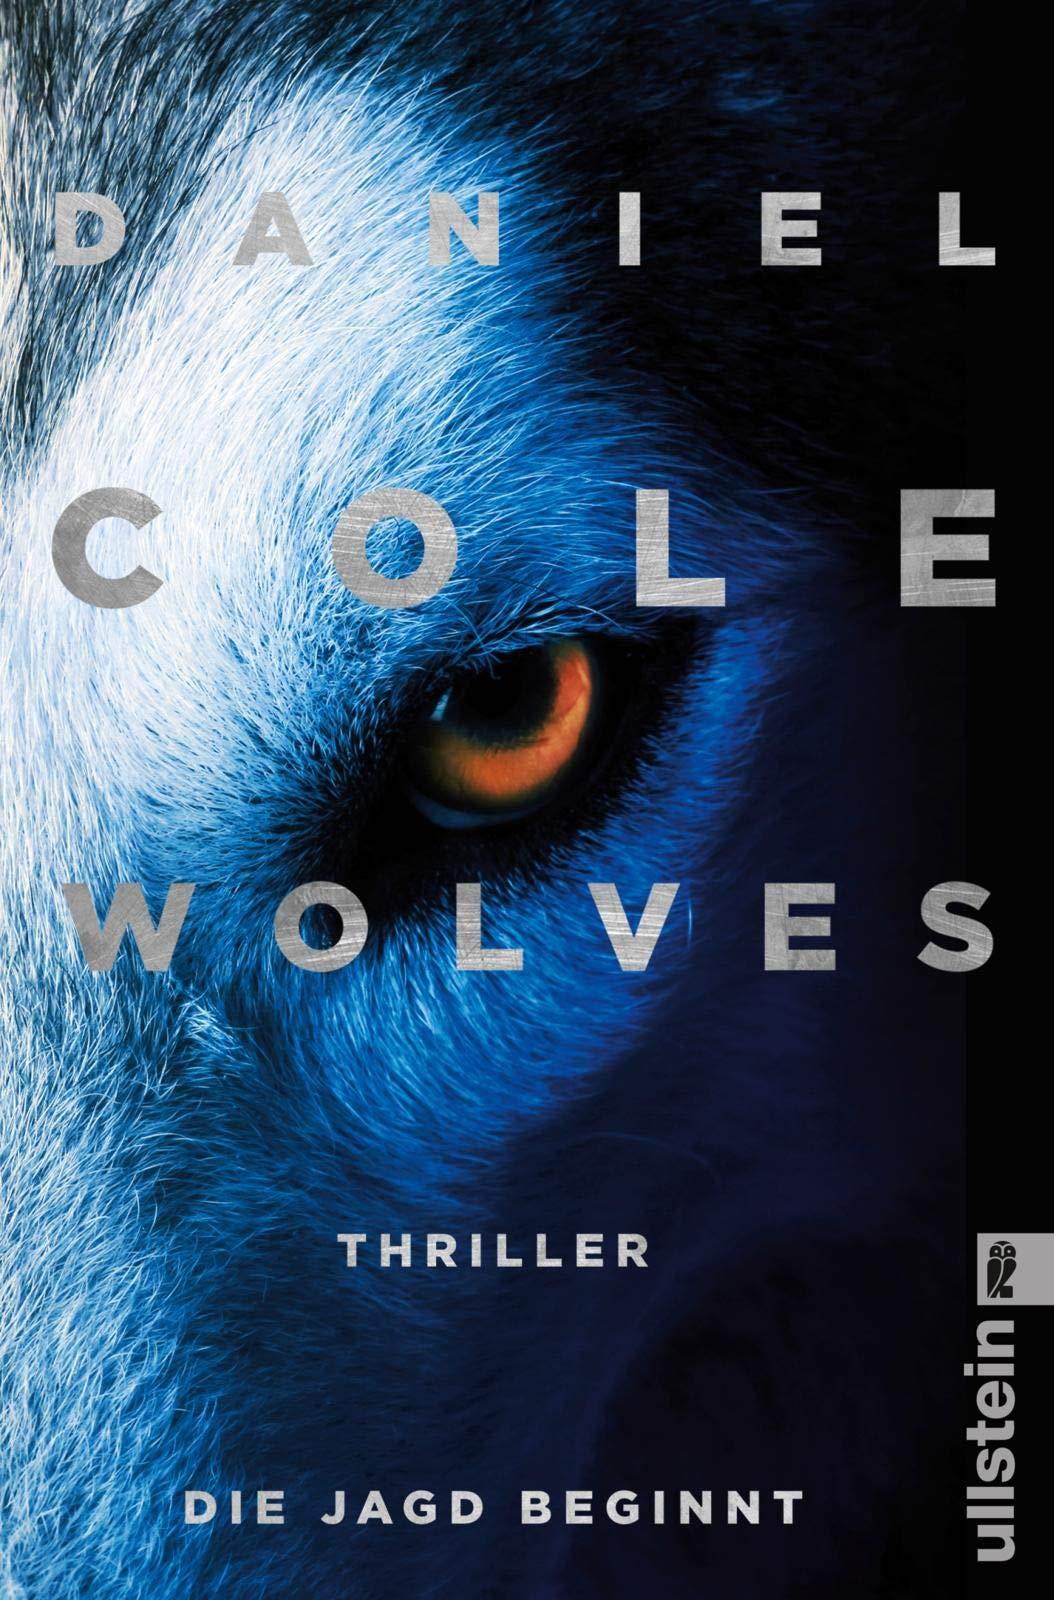 conver wolves